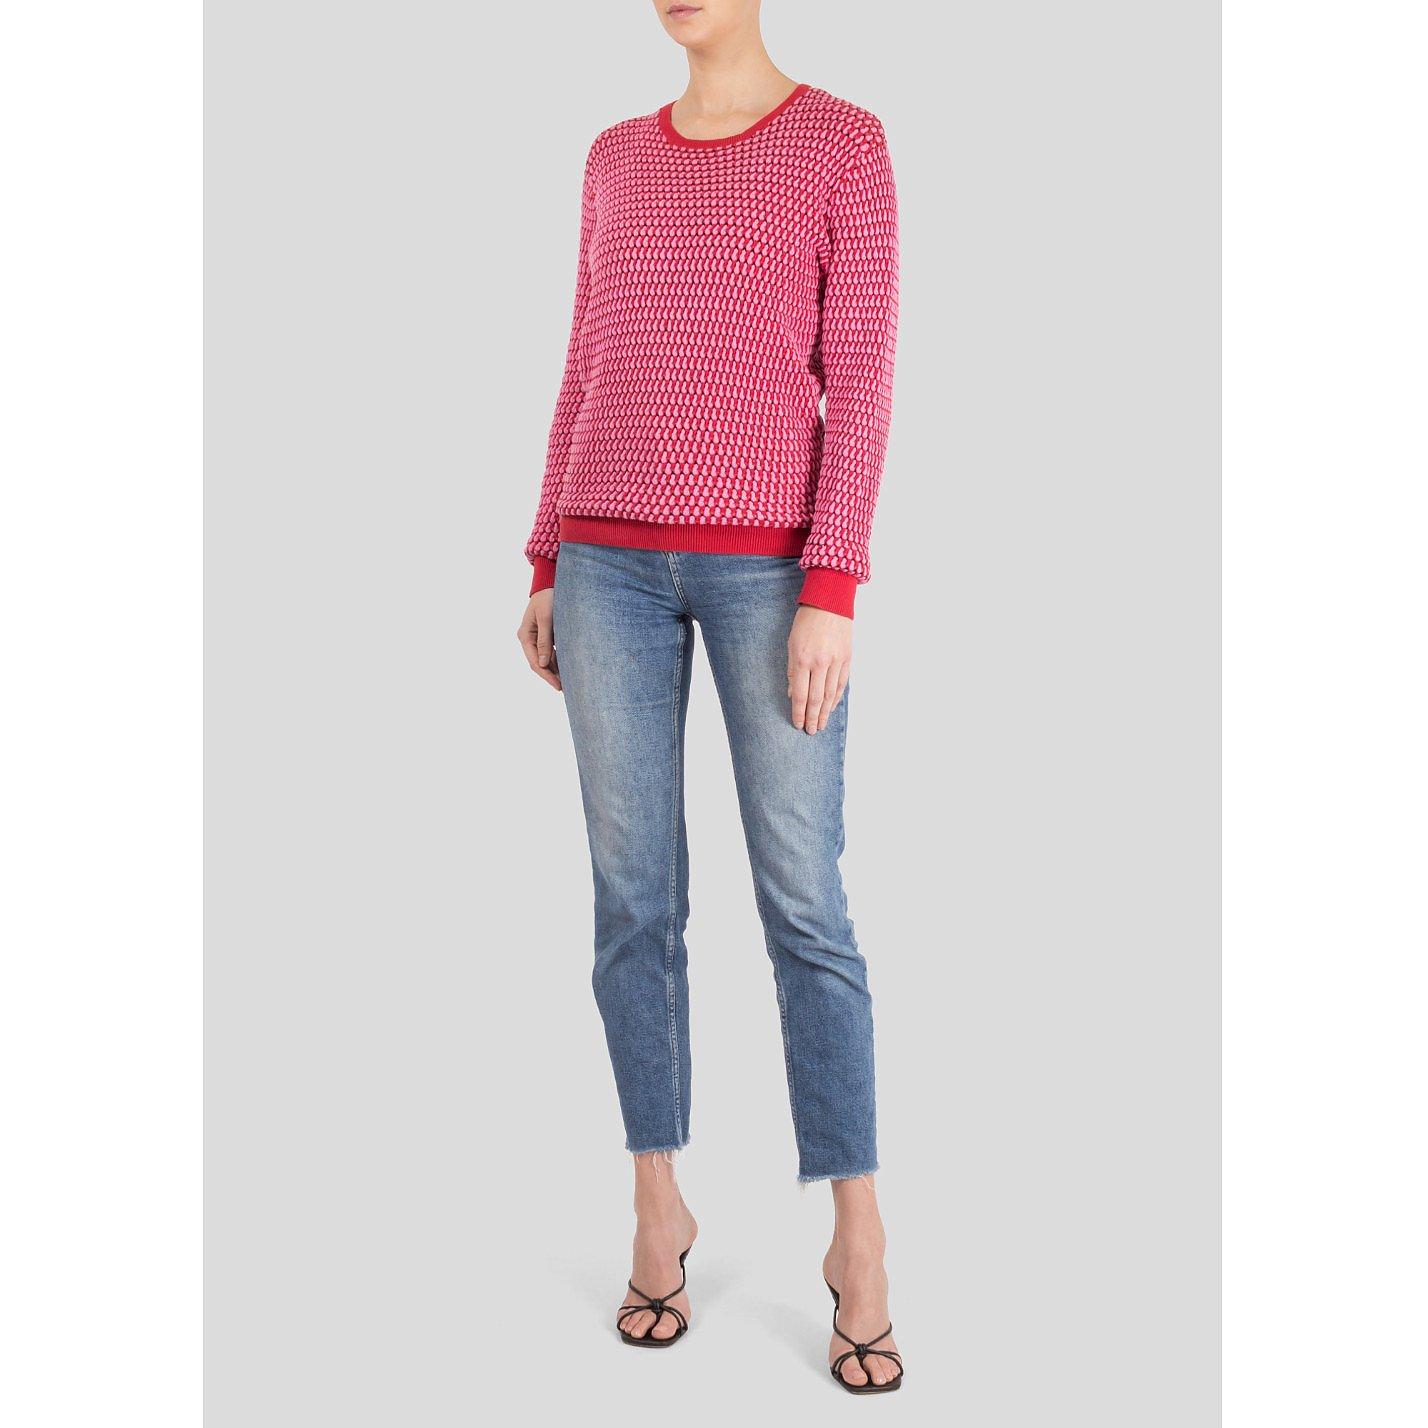 Jonathan Saunders Woven Cotton Sweater